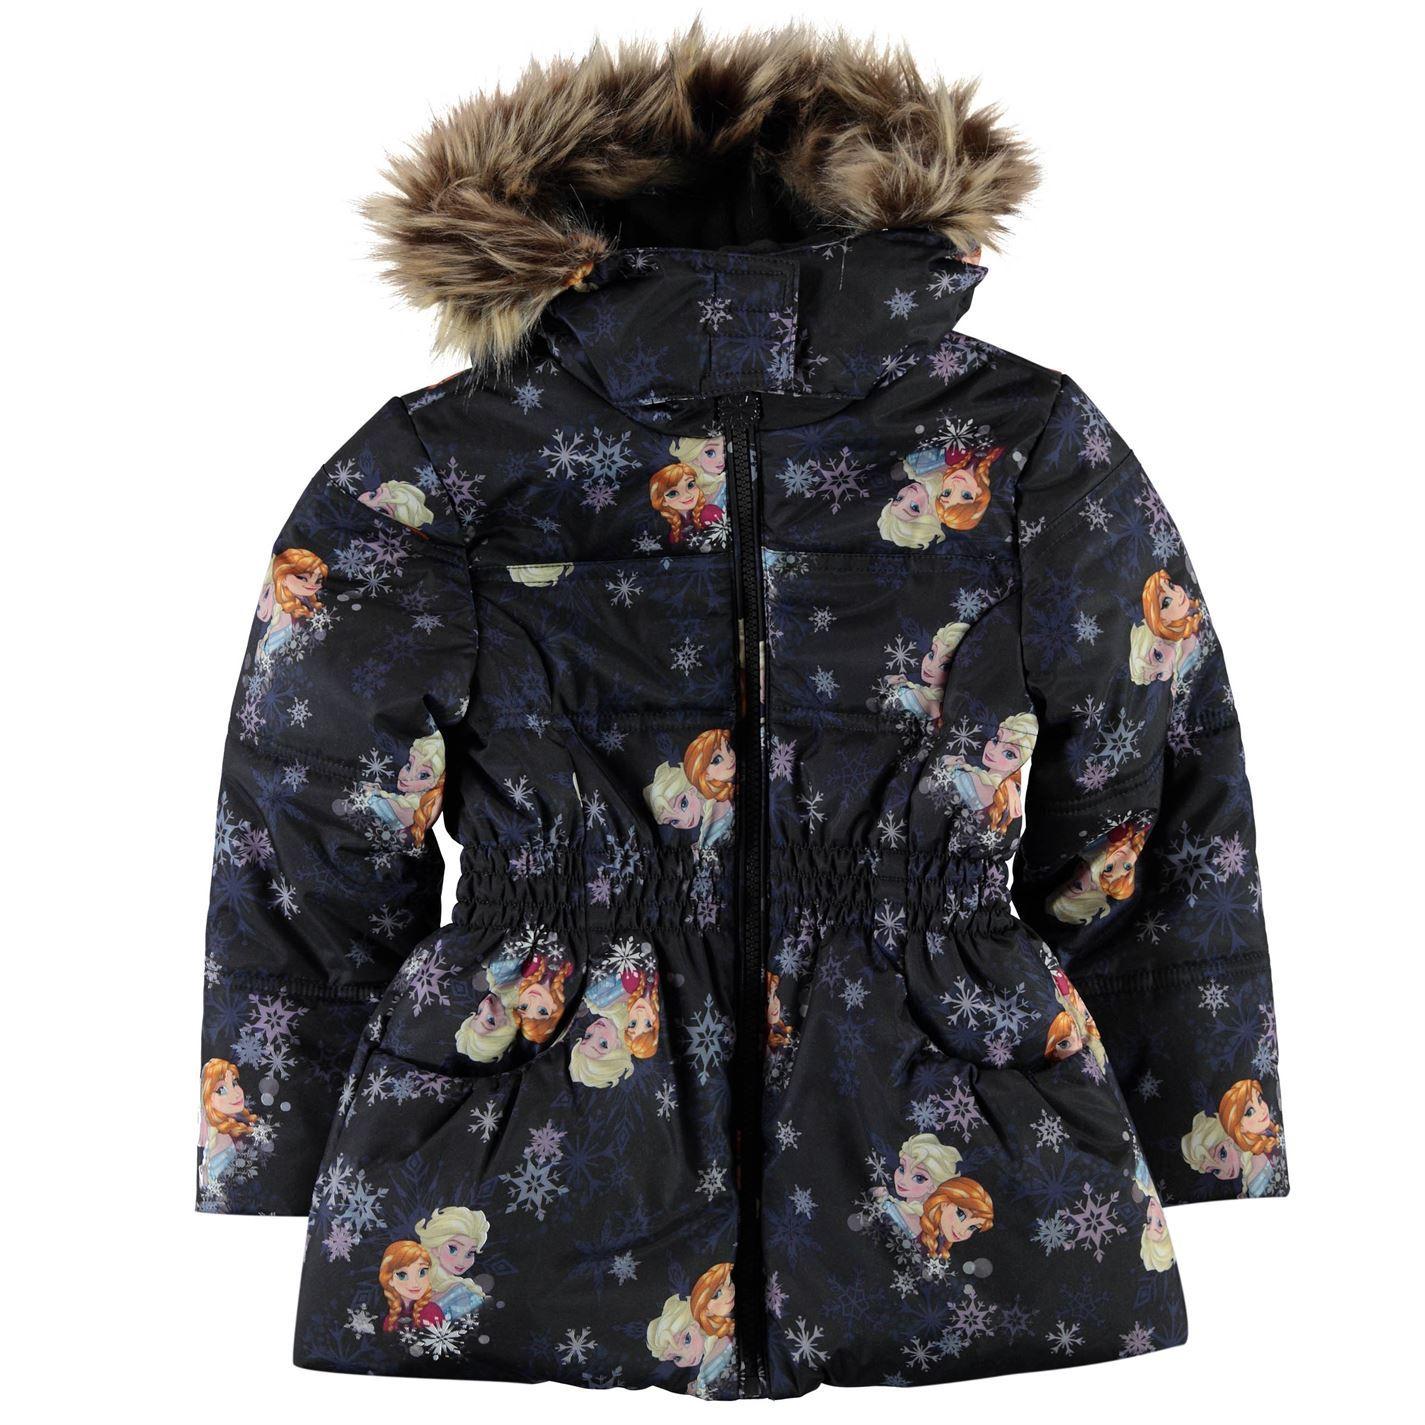 d5ee6d332aff Character Padded Coat Infant Junior Girls Outerwear Jacket Raincoat ...